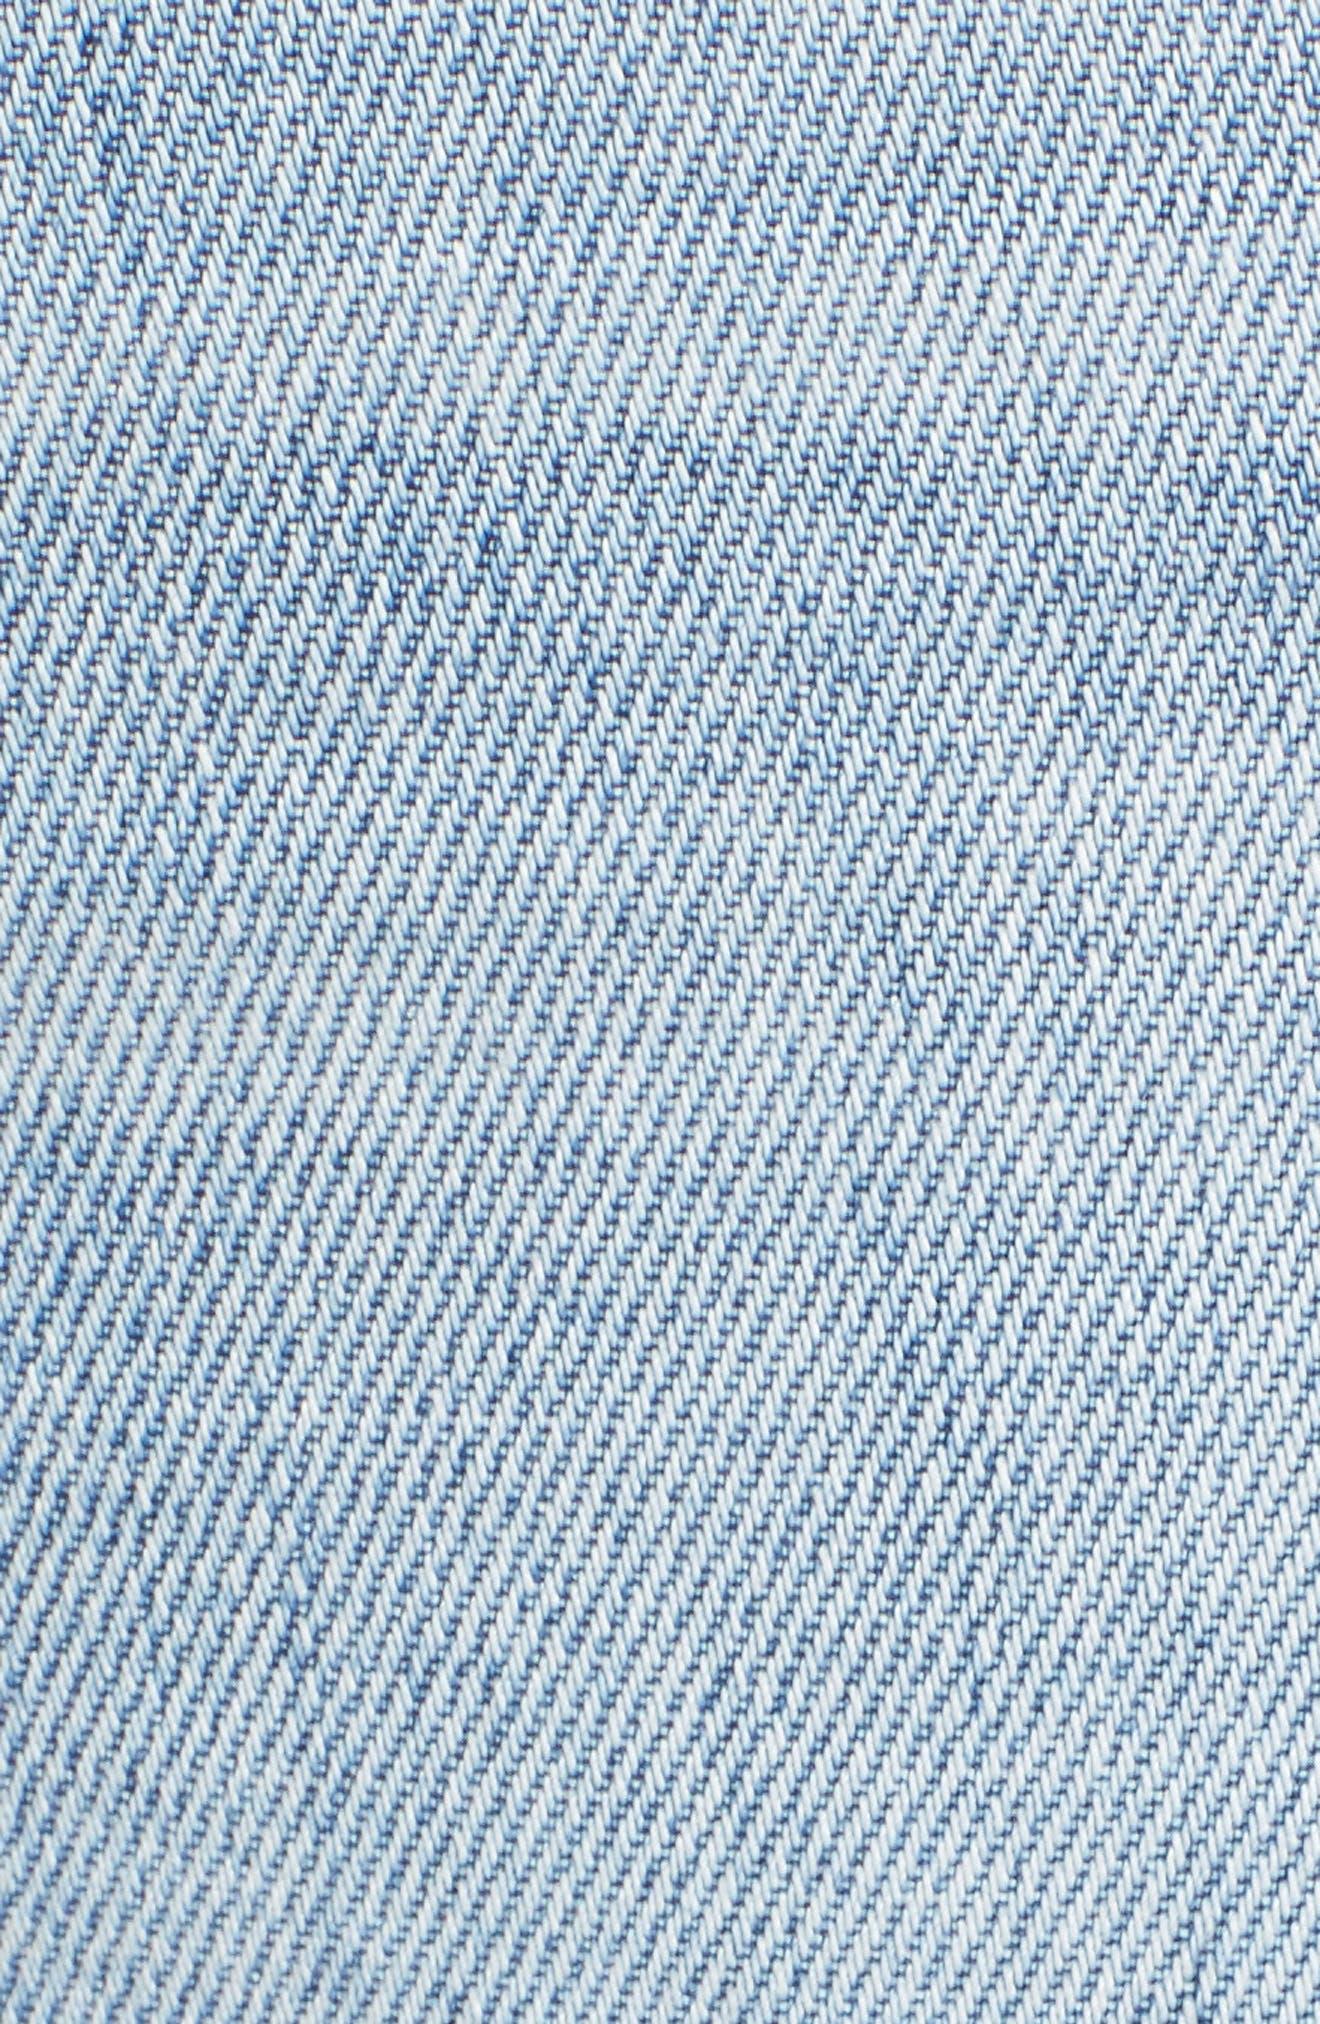 Rocket High Waist Crop Skinny Jeans,                             Alternate thumbnail 5, color,                             Oracle Blue